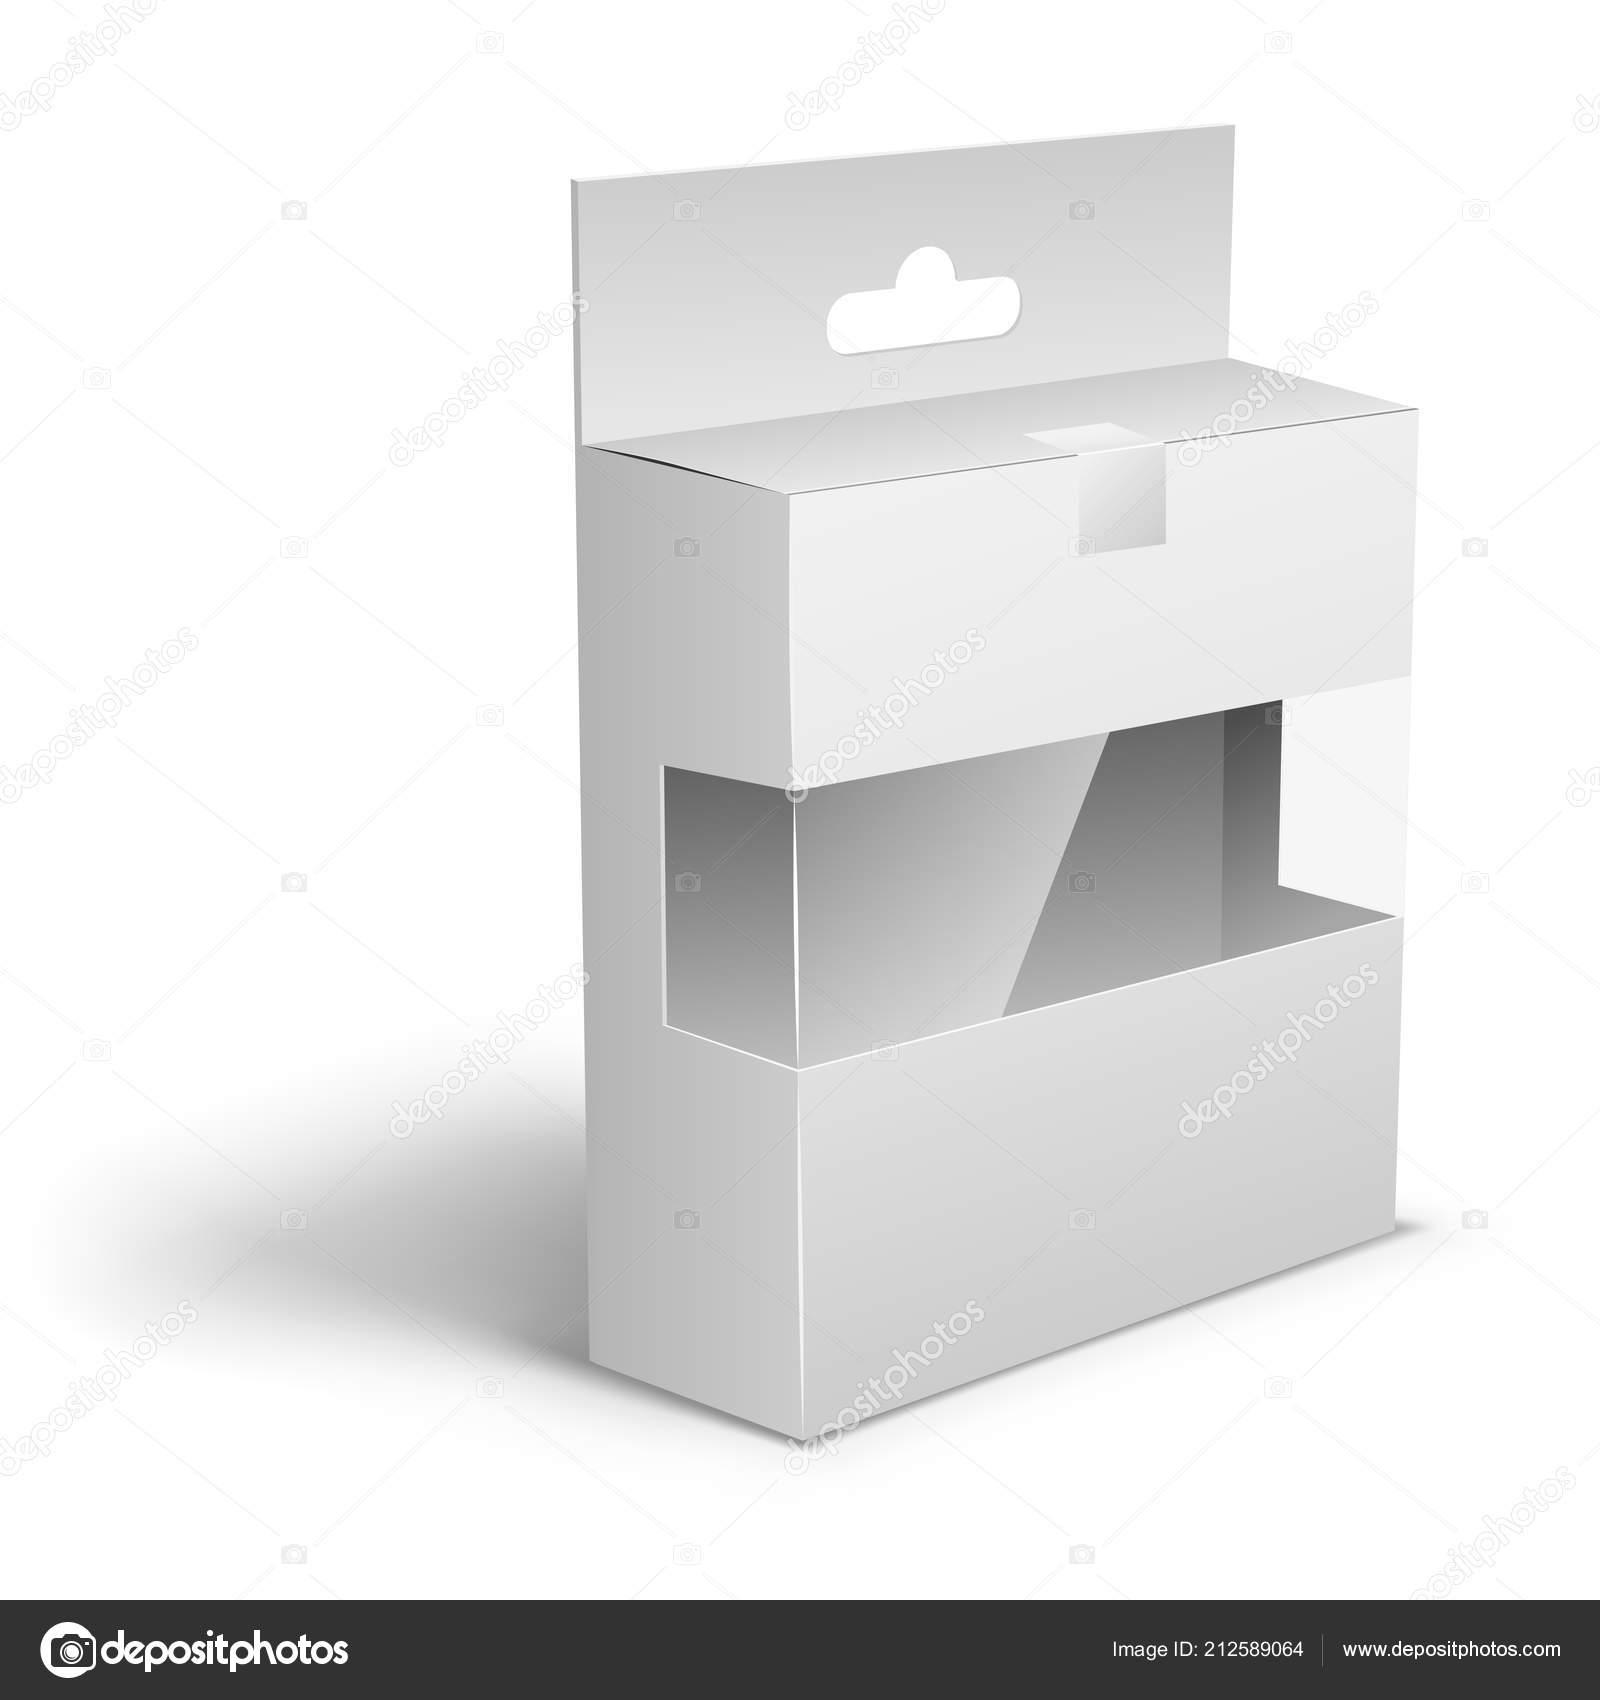 Blank Packaging Box Design Topsimages